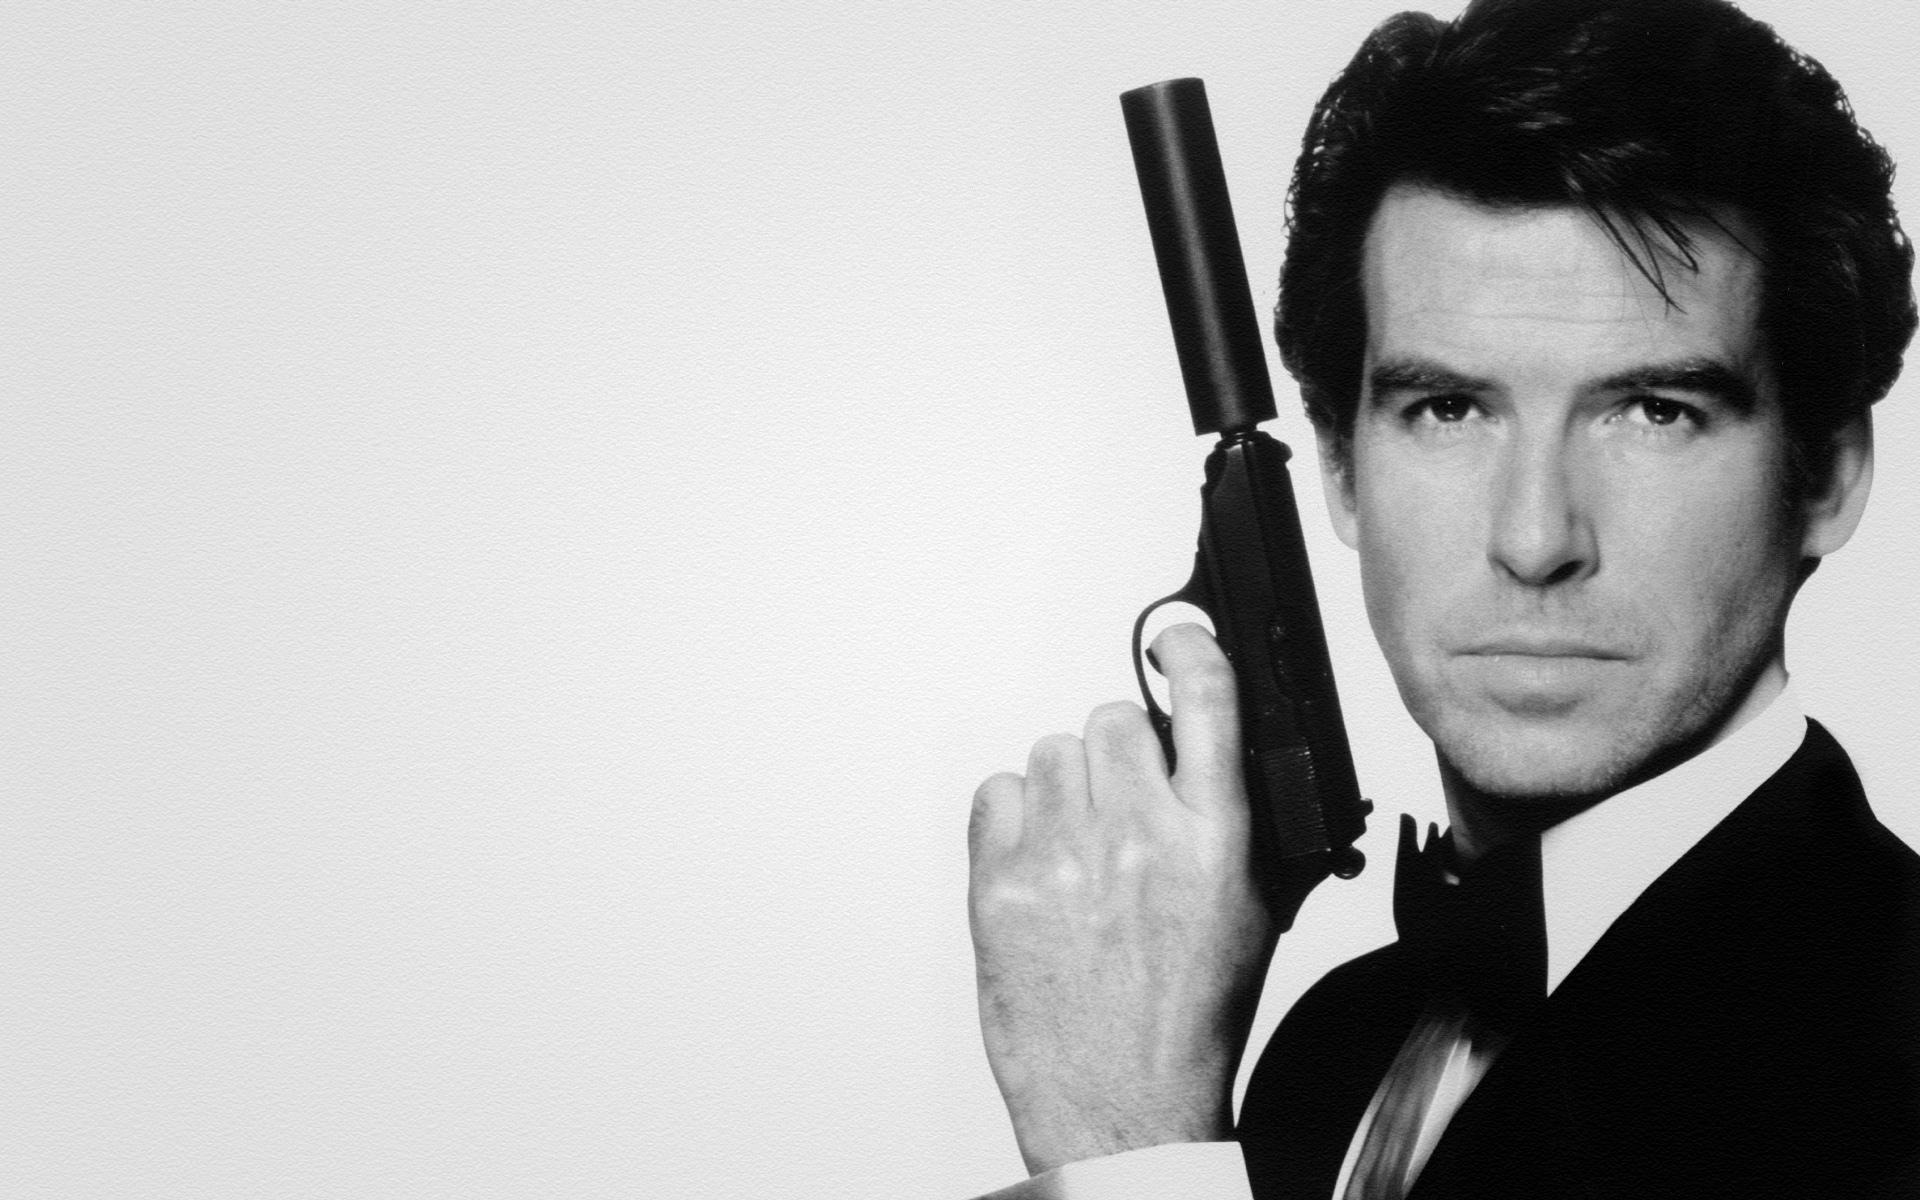 Ex-James-Bond-Darsteller Pierce Brosnan